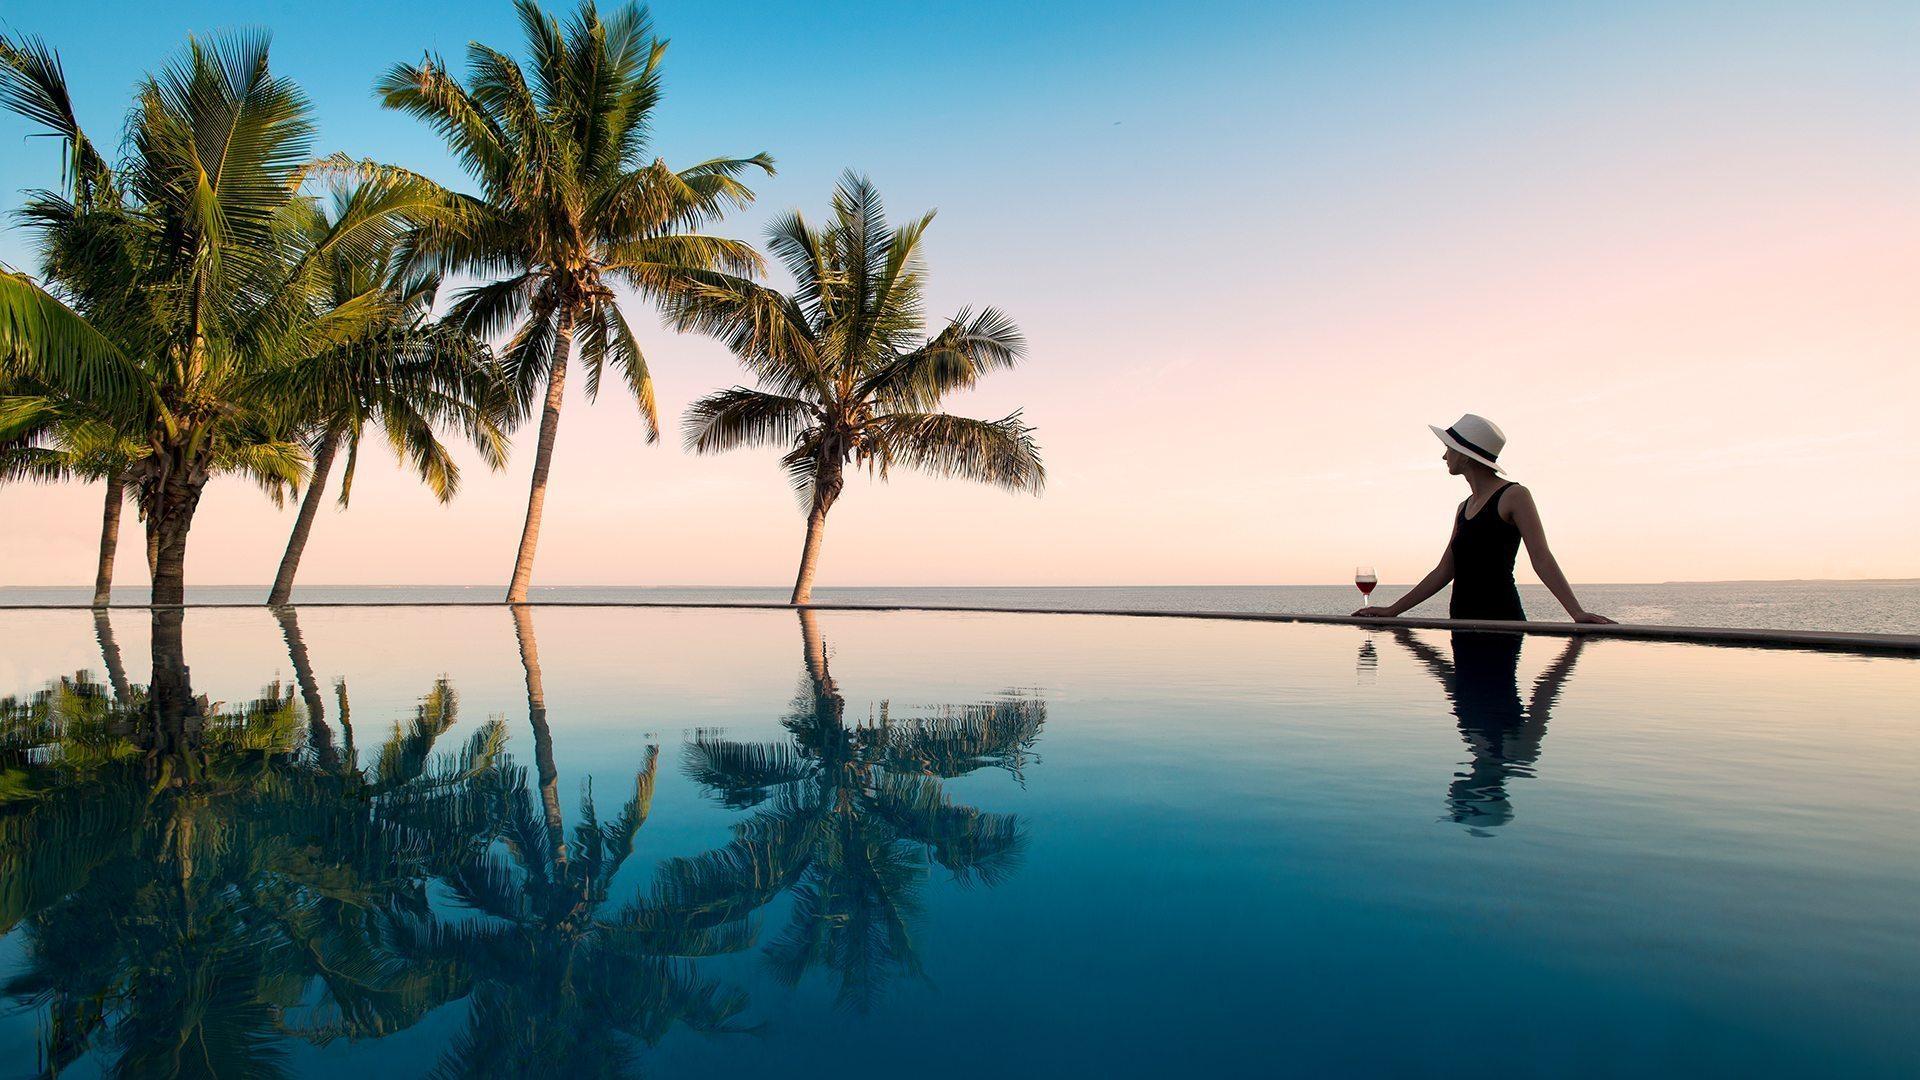 andBeyond-benguerra-island-on-a-mozambique-luxury-beach-resort